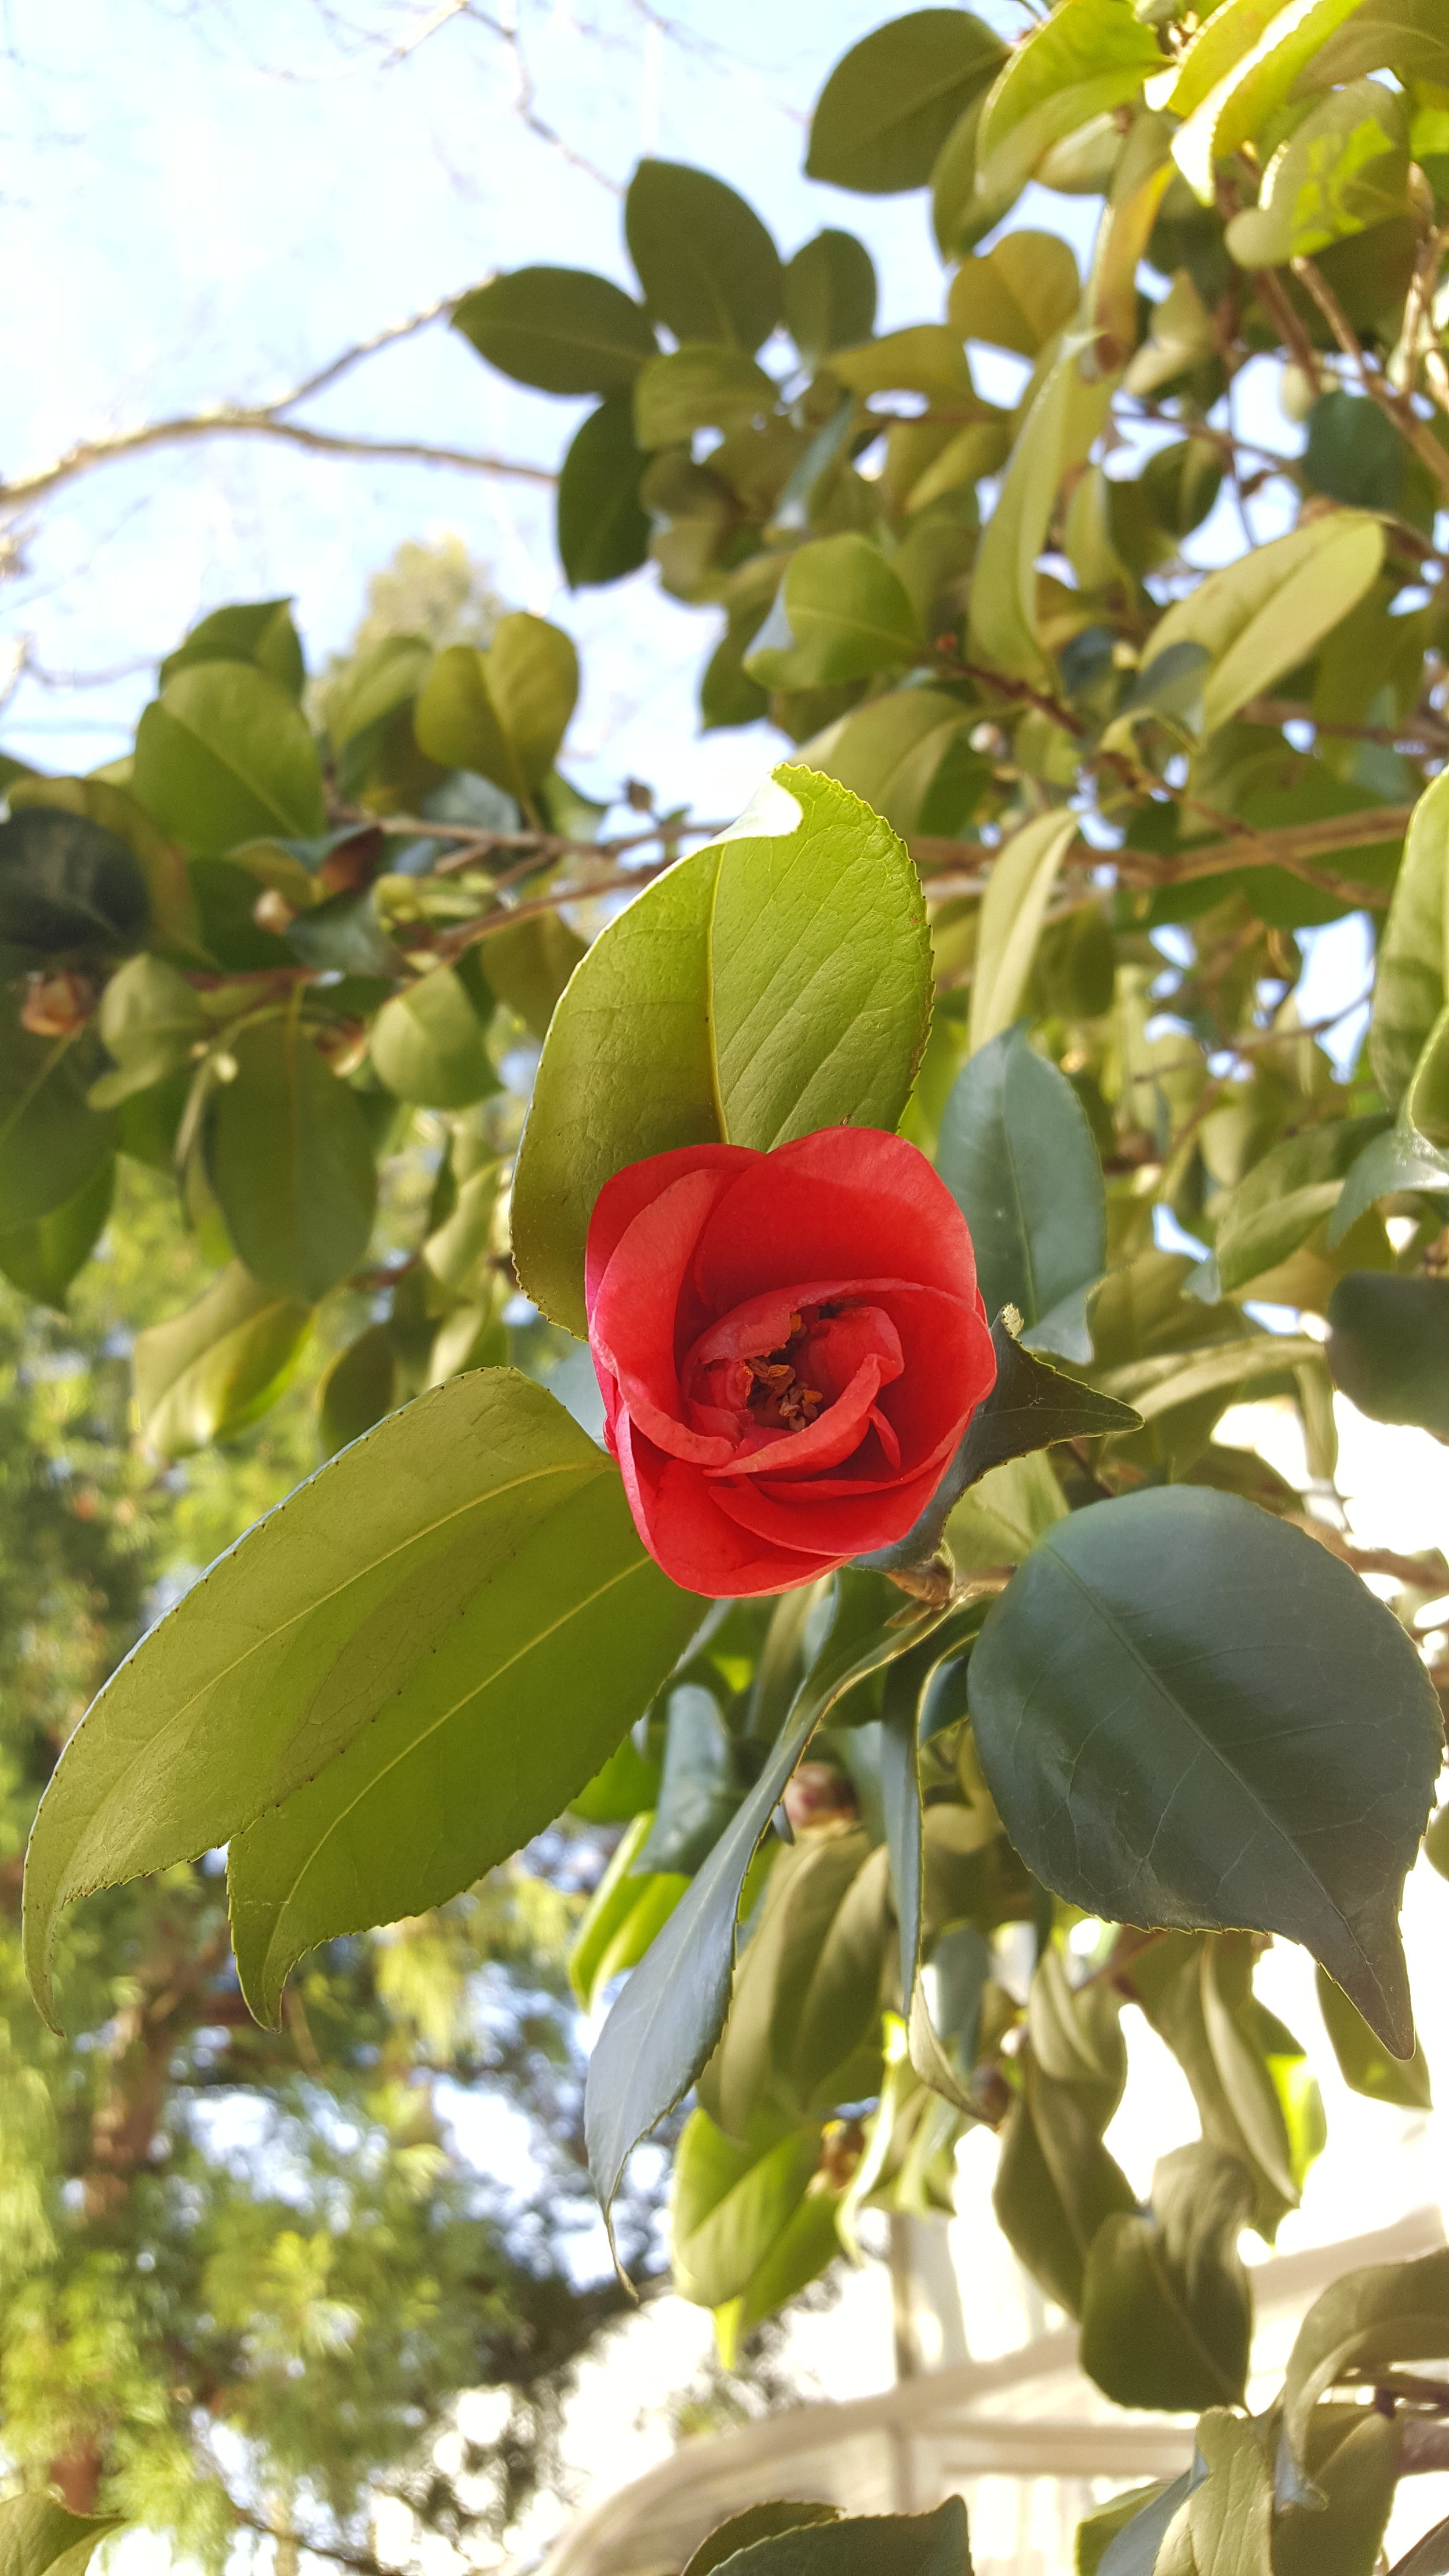 camillia japonica_3-24-2019.jpg